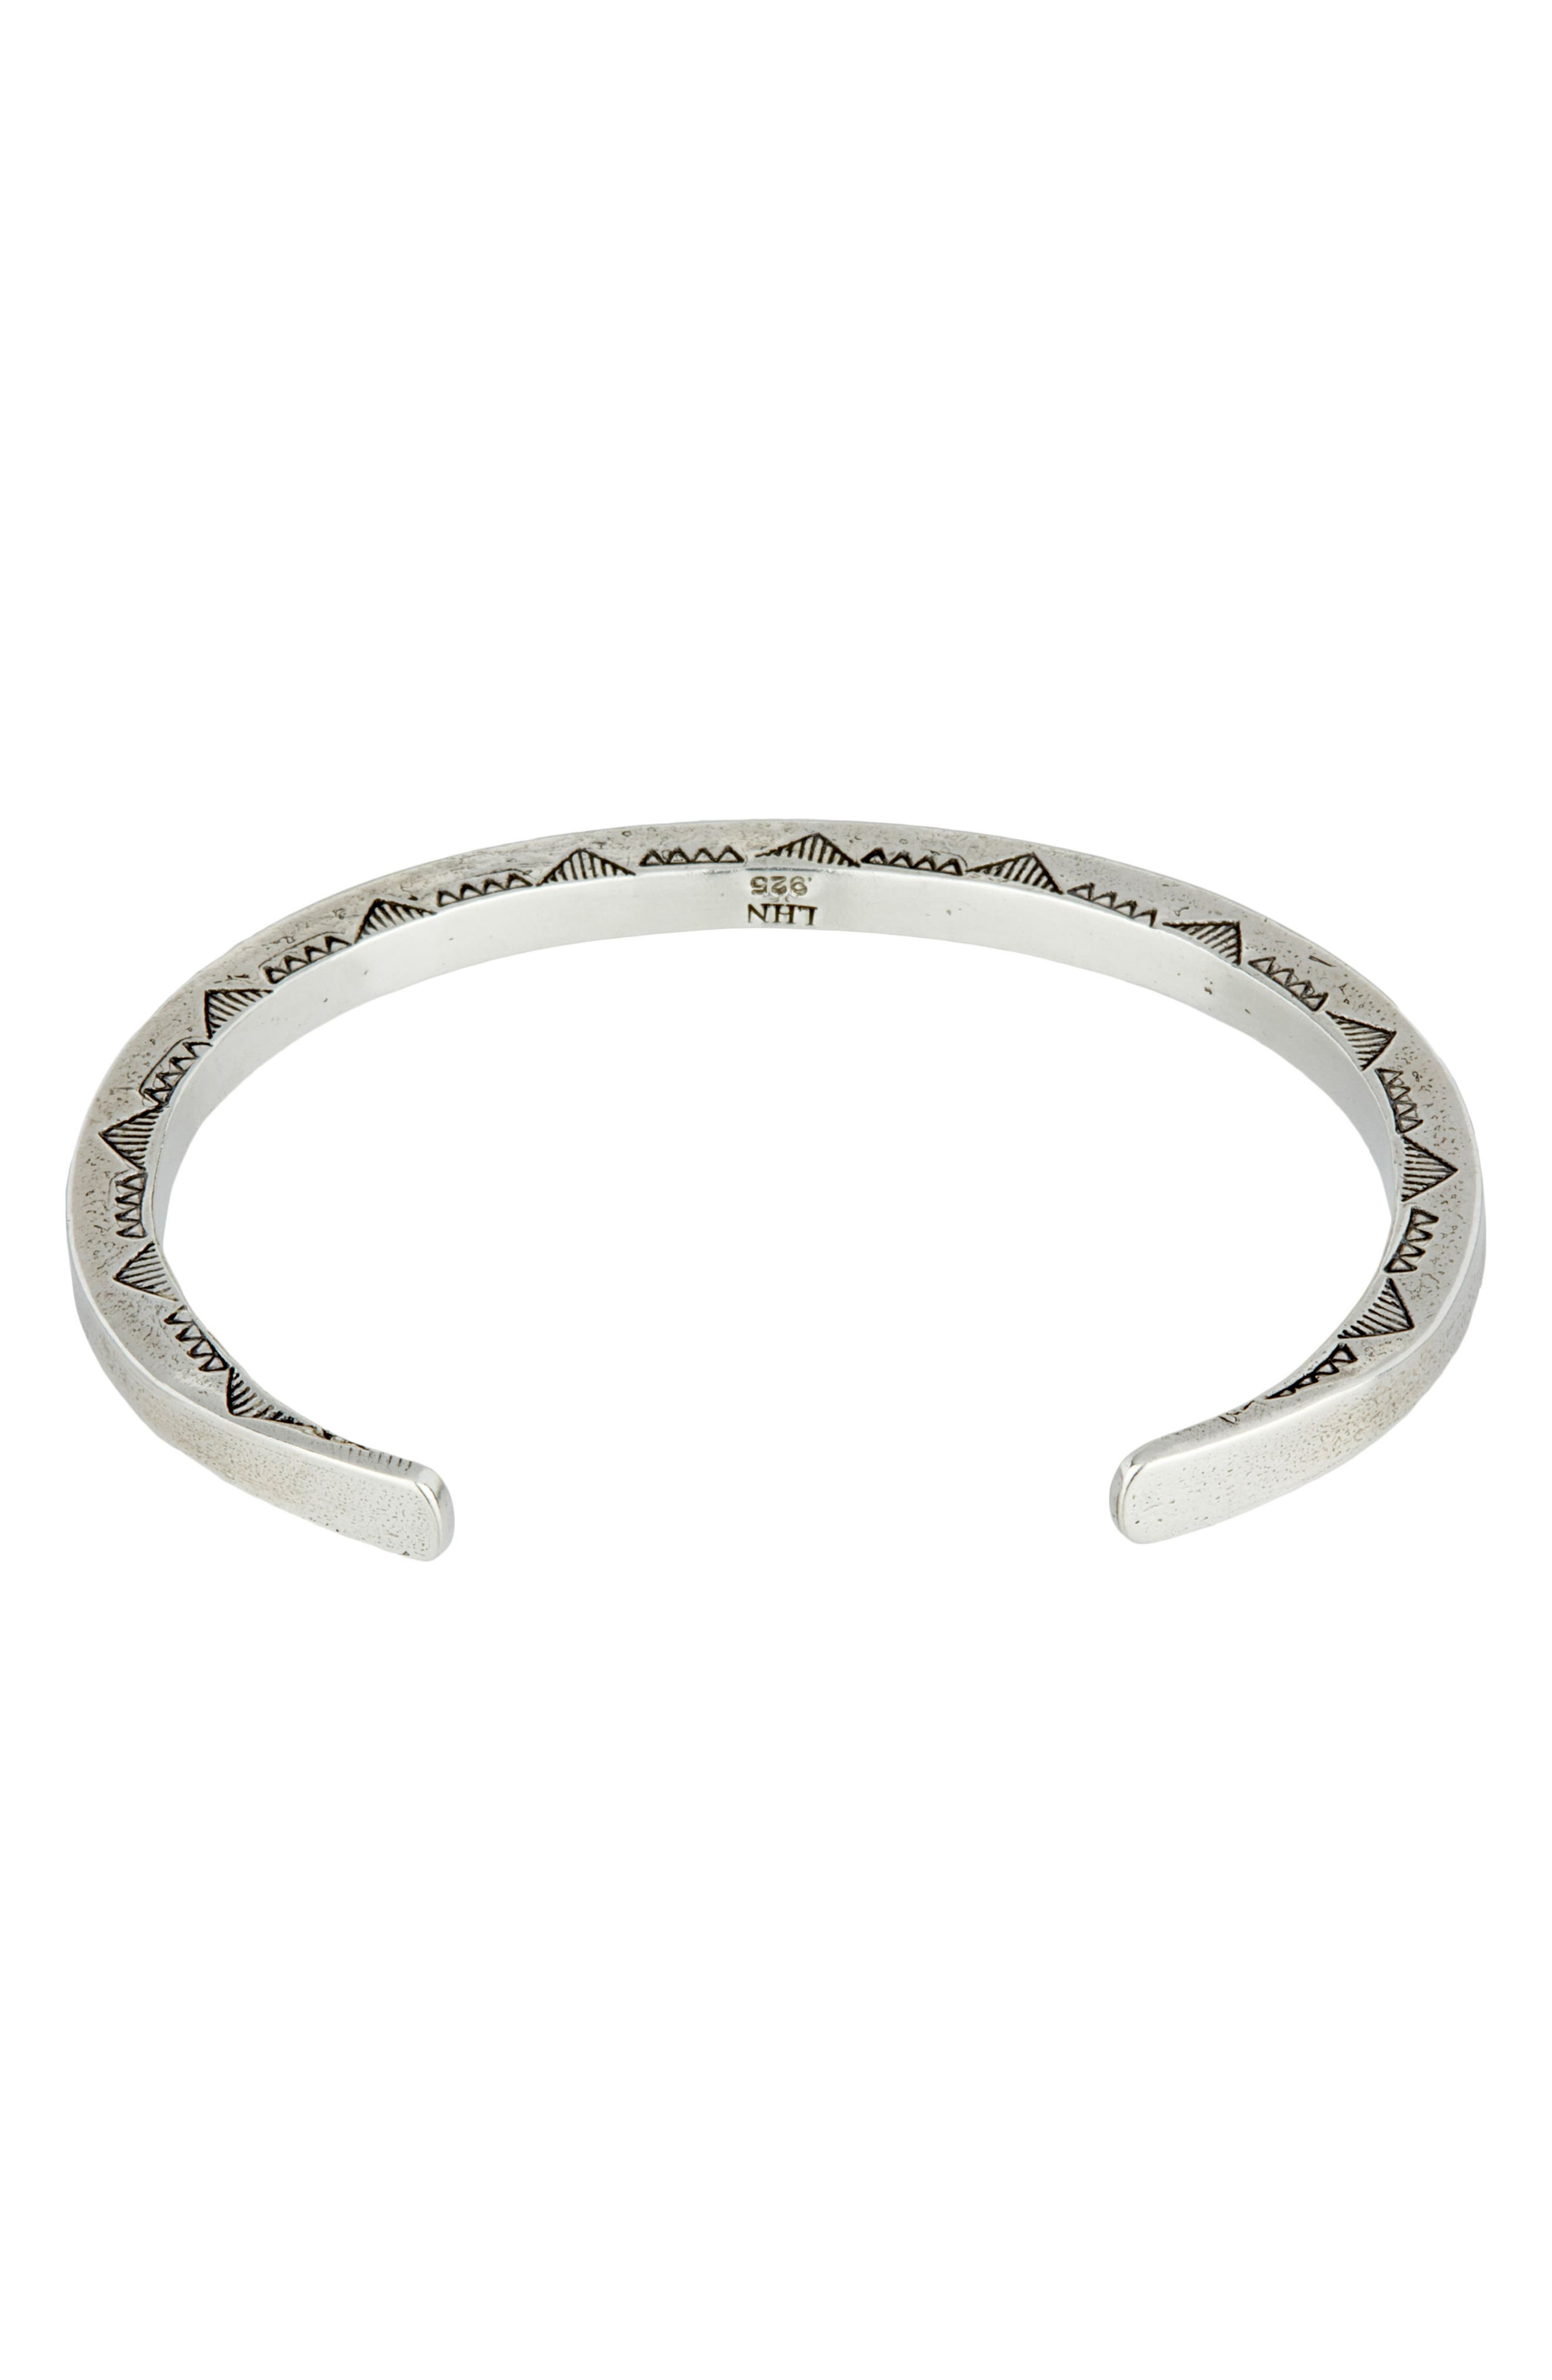 Sterling Silver Cuff Bracelet,                             Alternate thumbnail 2, color,                             Silver